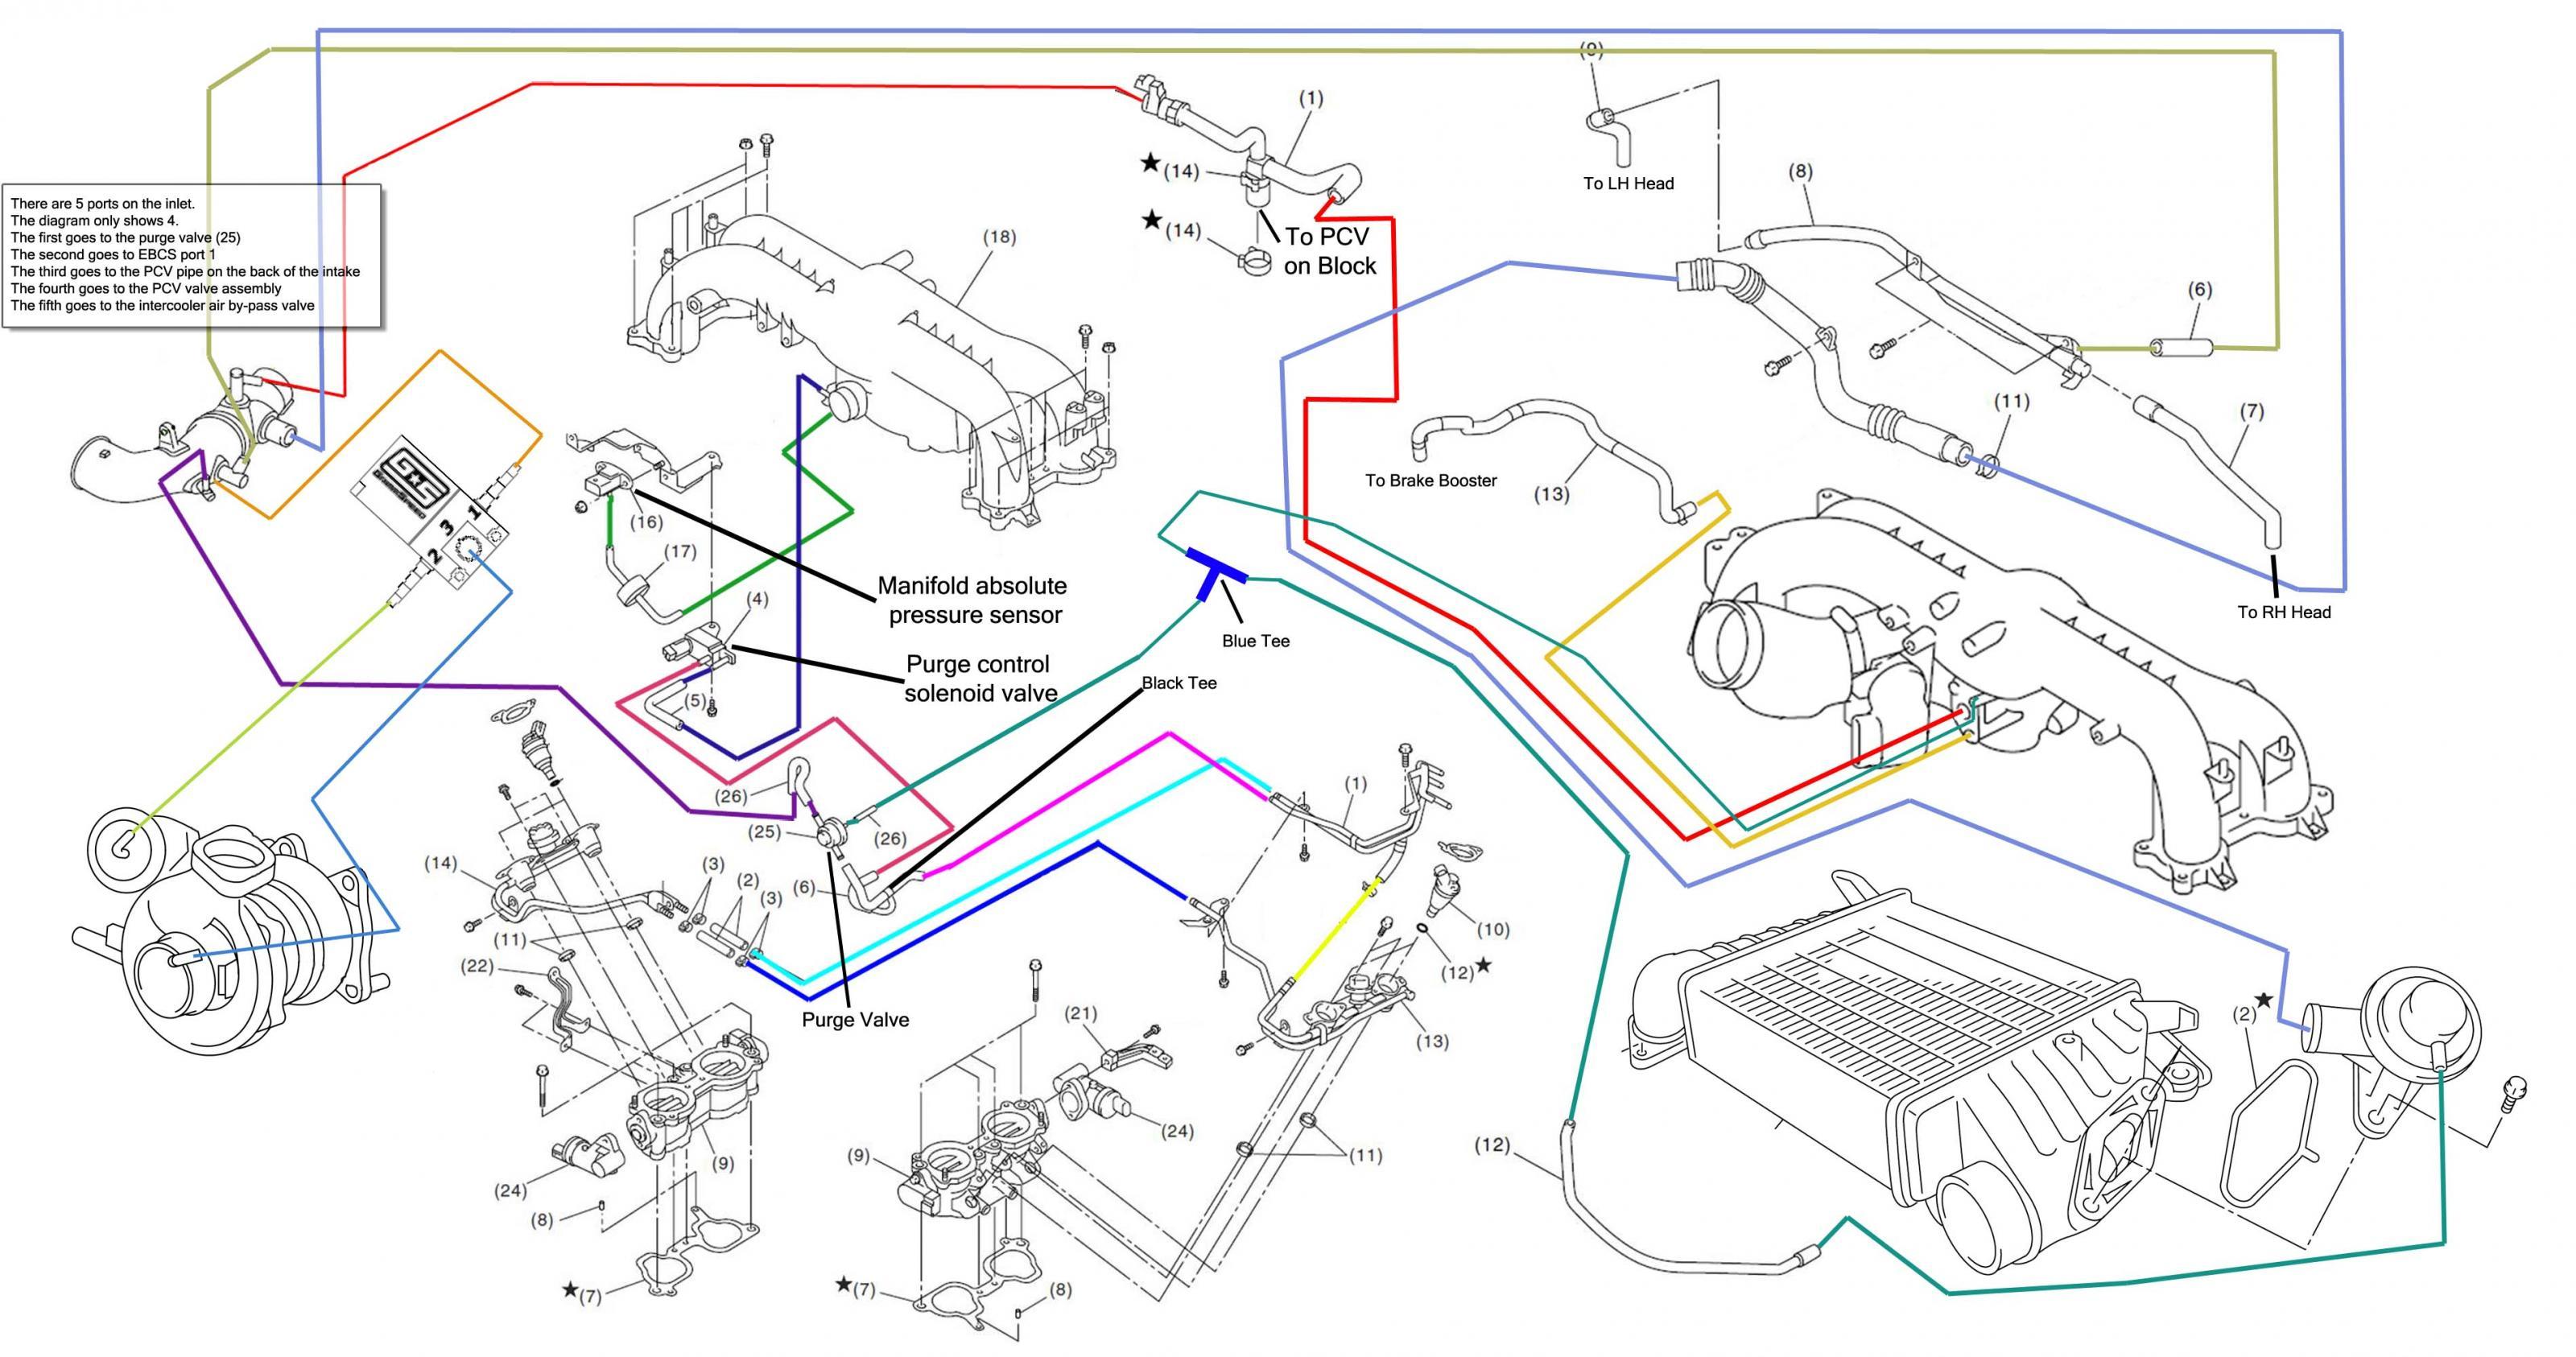 Injectors 2004 Aveo Wiring Diagram moreover Rx8 Progress Technologies Rear Swaybar Install also Daewoo Matiz Ecu Wiring Diagram likewise Emanage Ultimate Wiring Diagram besides Emanage Ultimate Wiring Diagram. on emanage install on an impreza l part 1